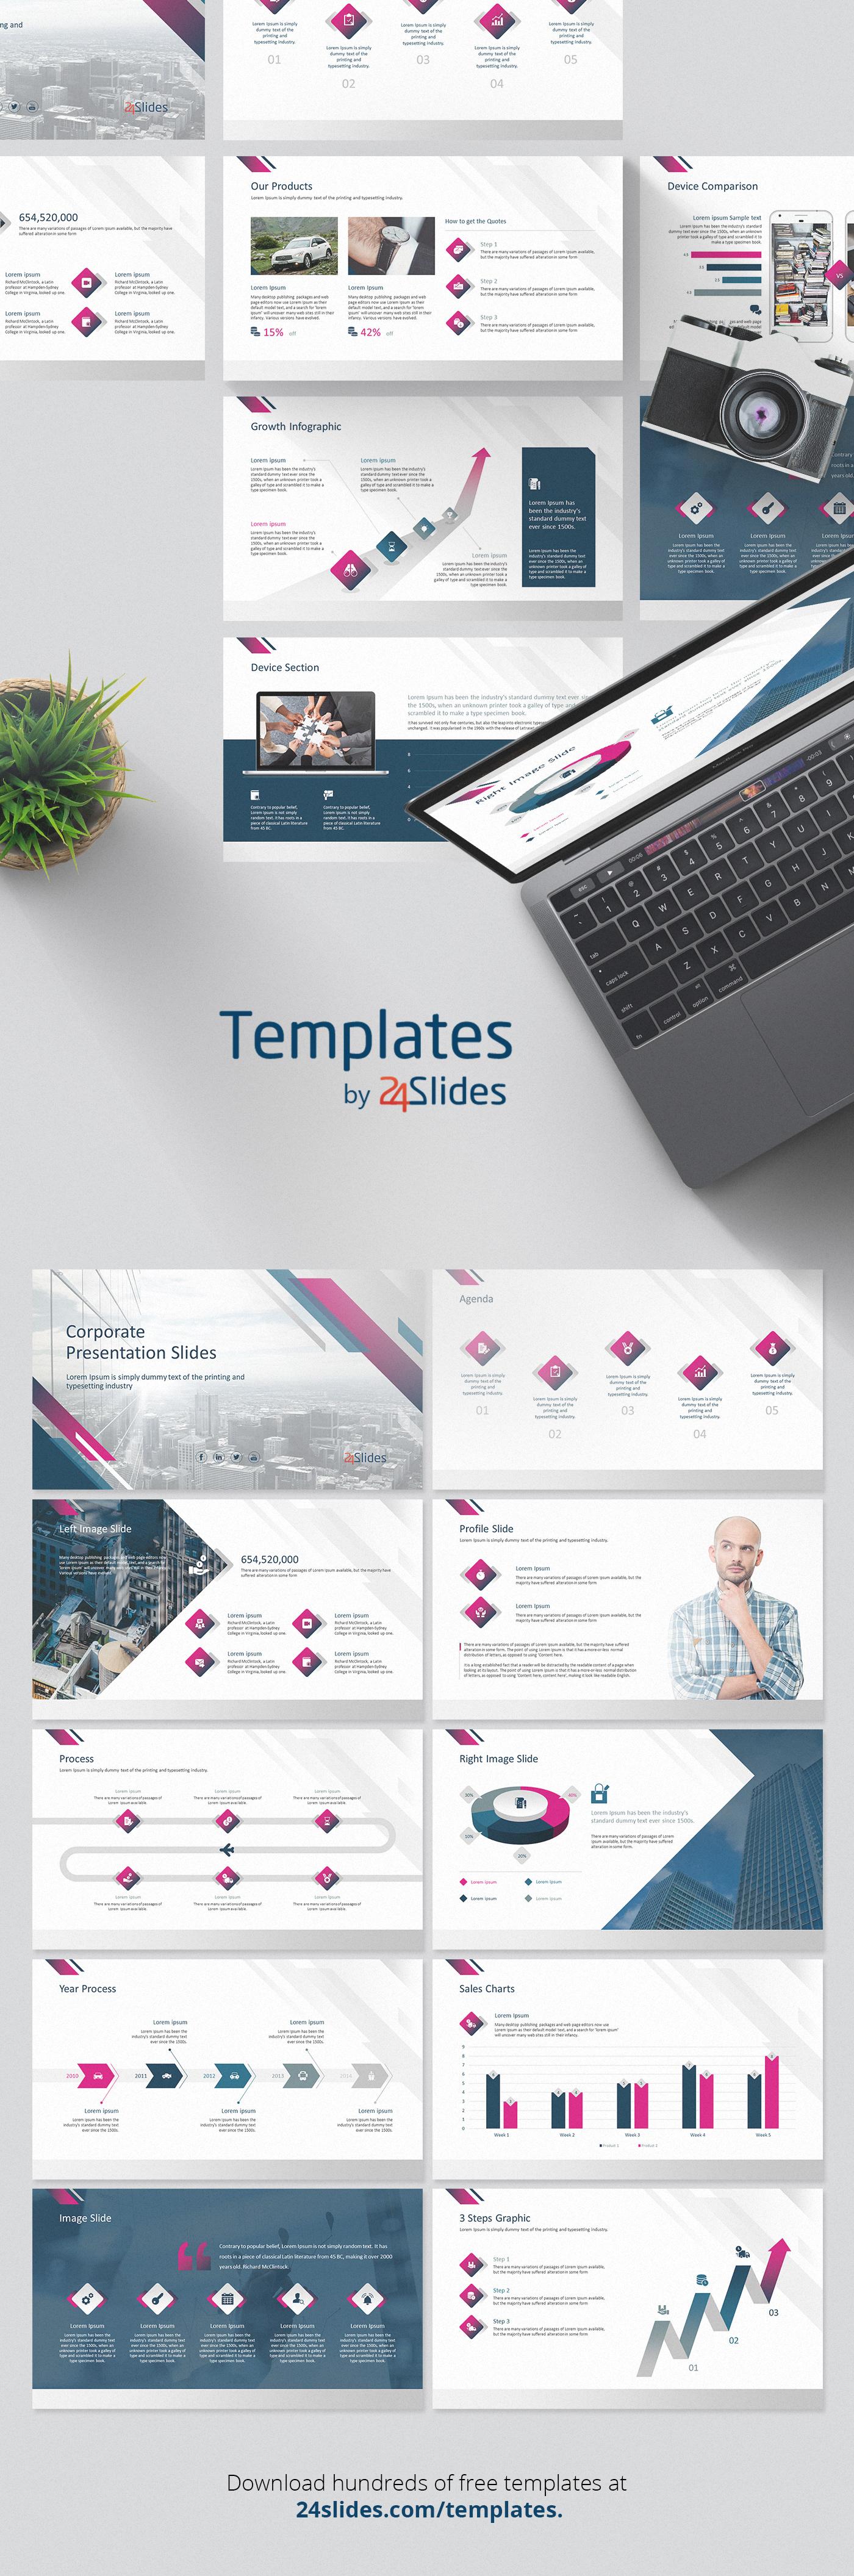 Presentation templates presentation Free Template corporate branding  Business presentation